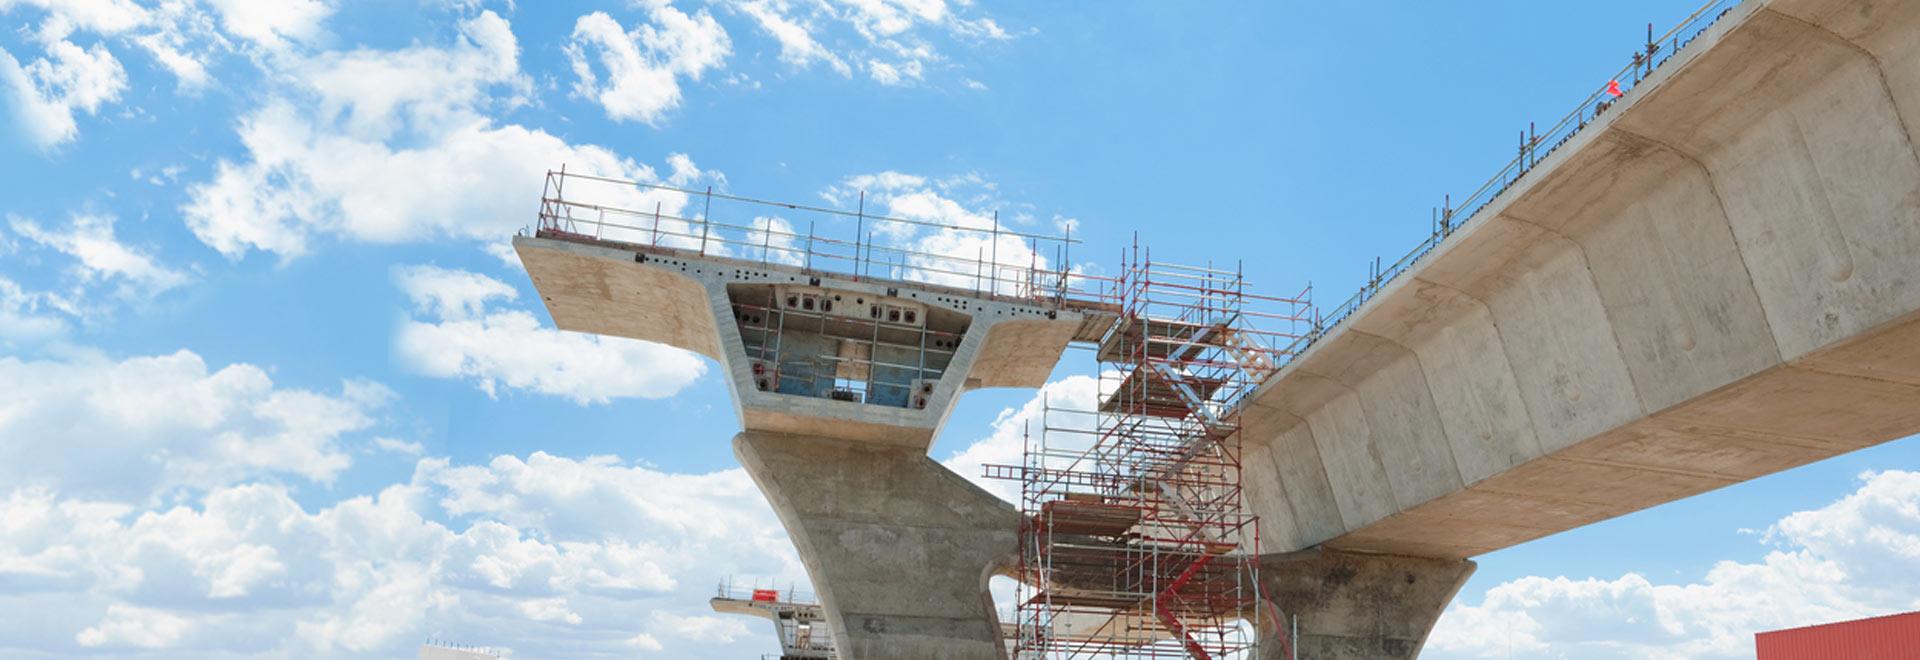 Bridge construction - slider element